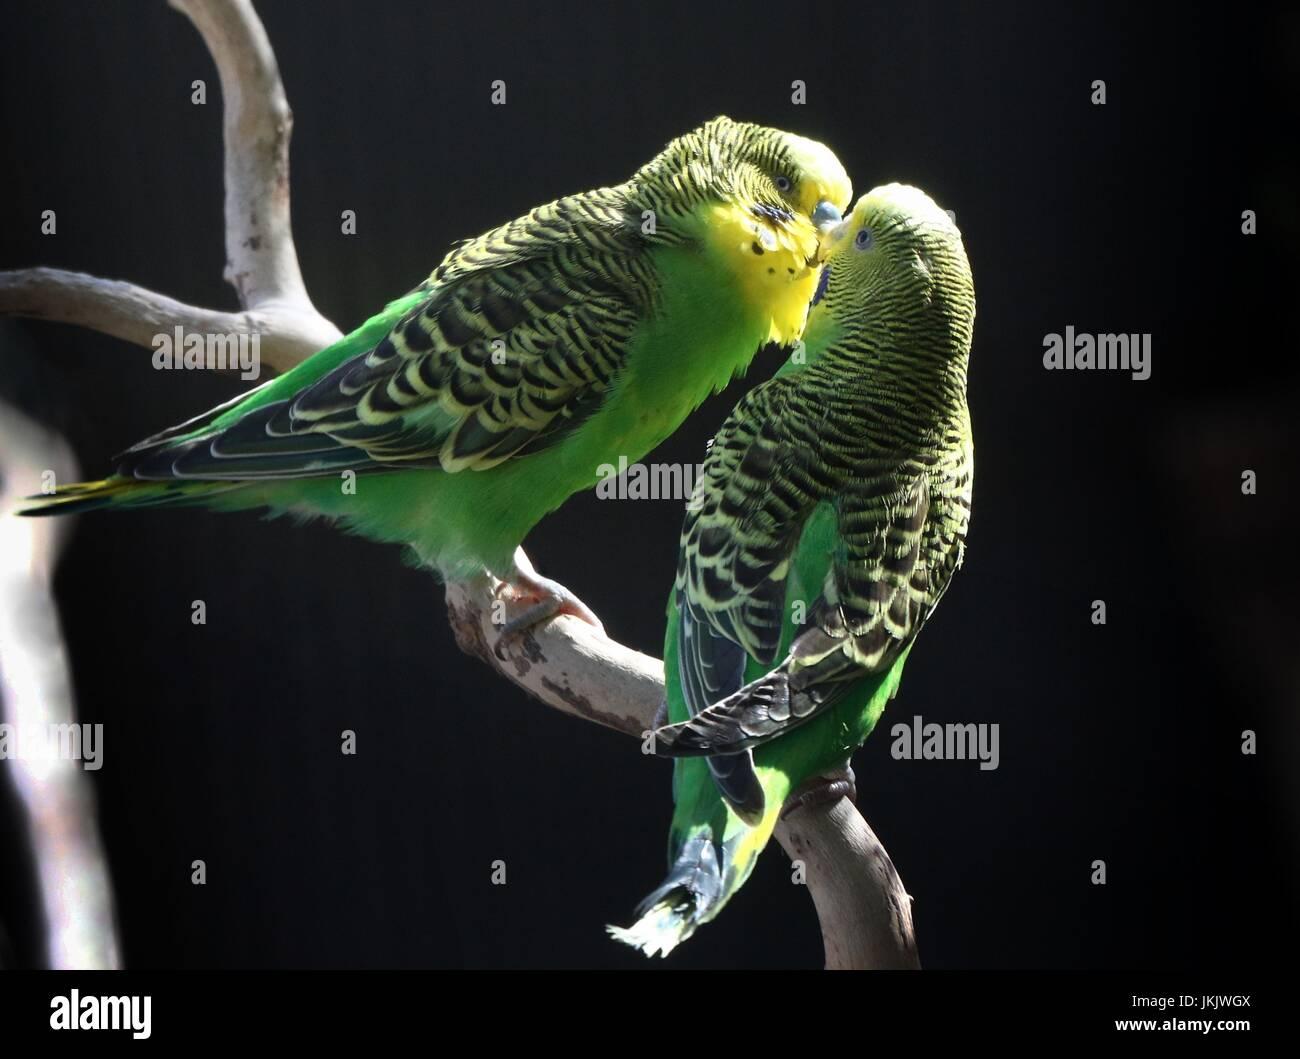 Pair of courting Australian Budgerigar Parakeets (Melopsittacus undulatus) in close-up. - Stock Image